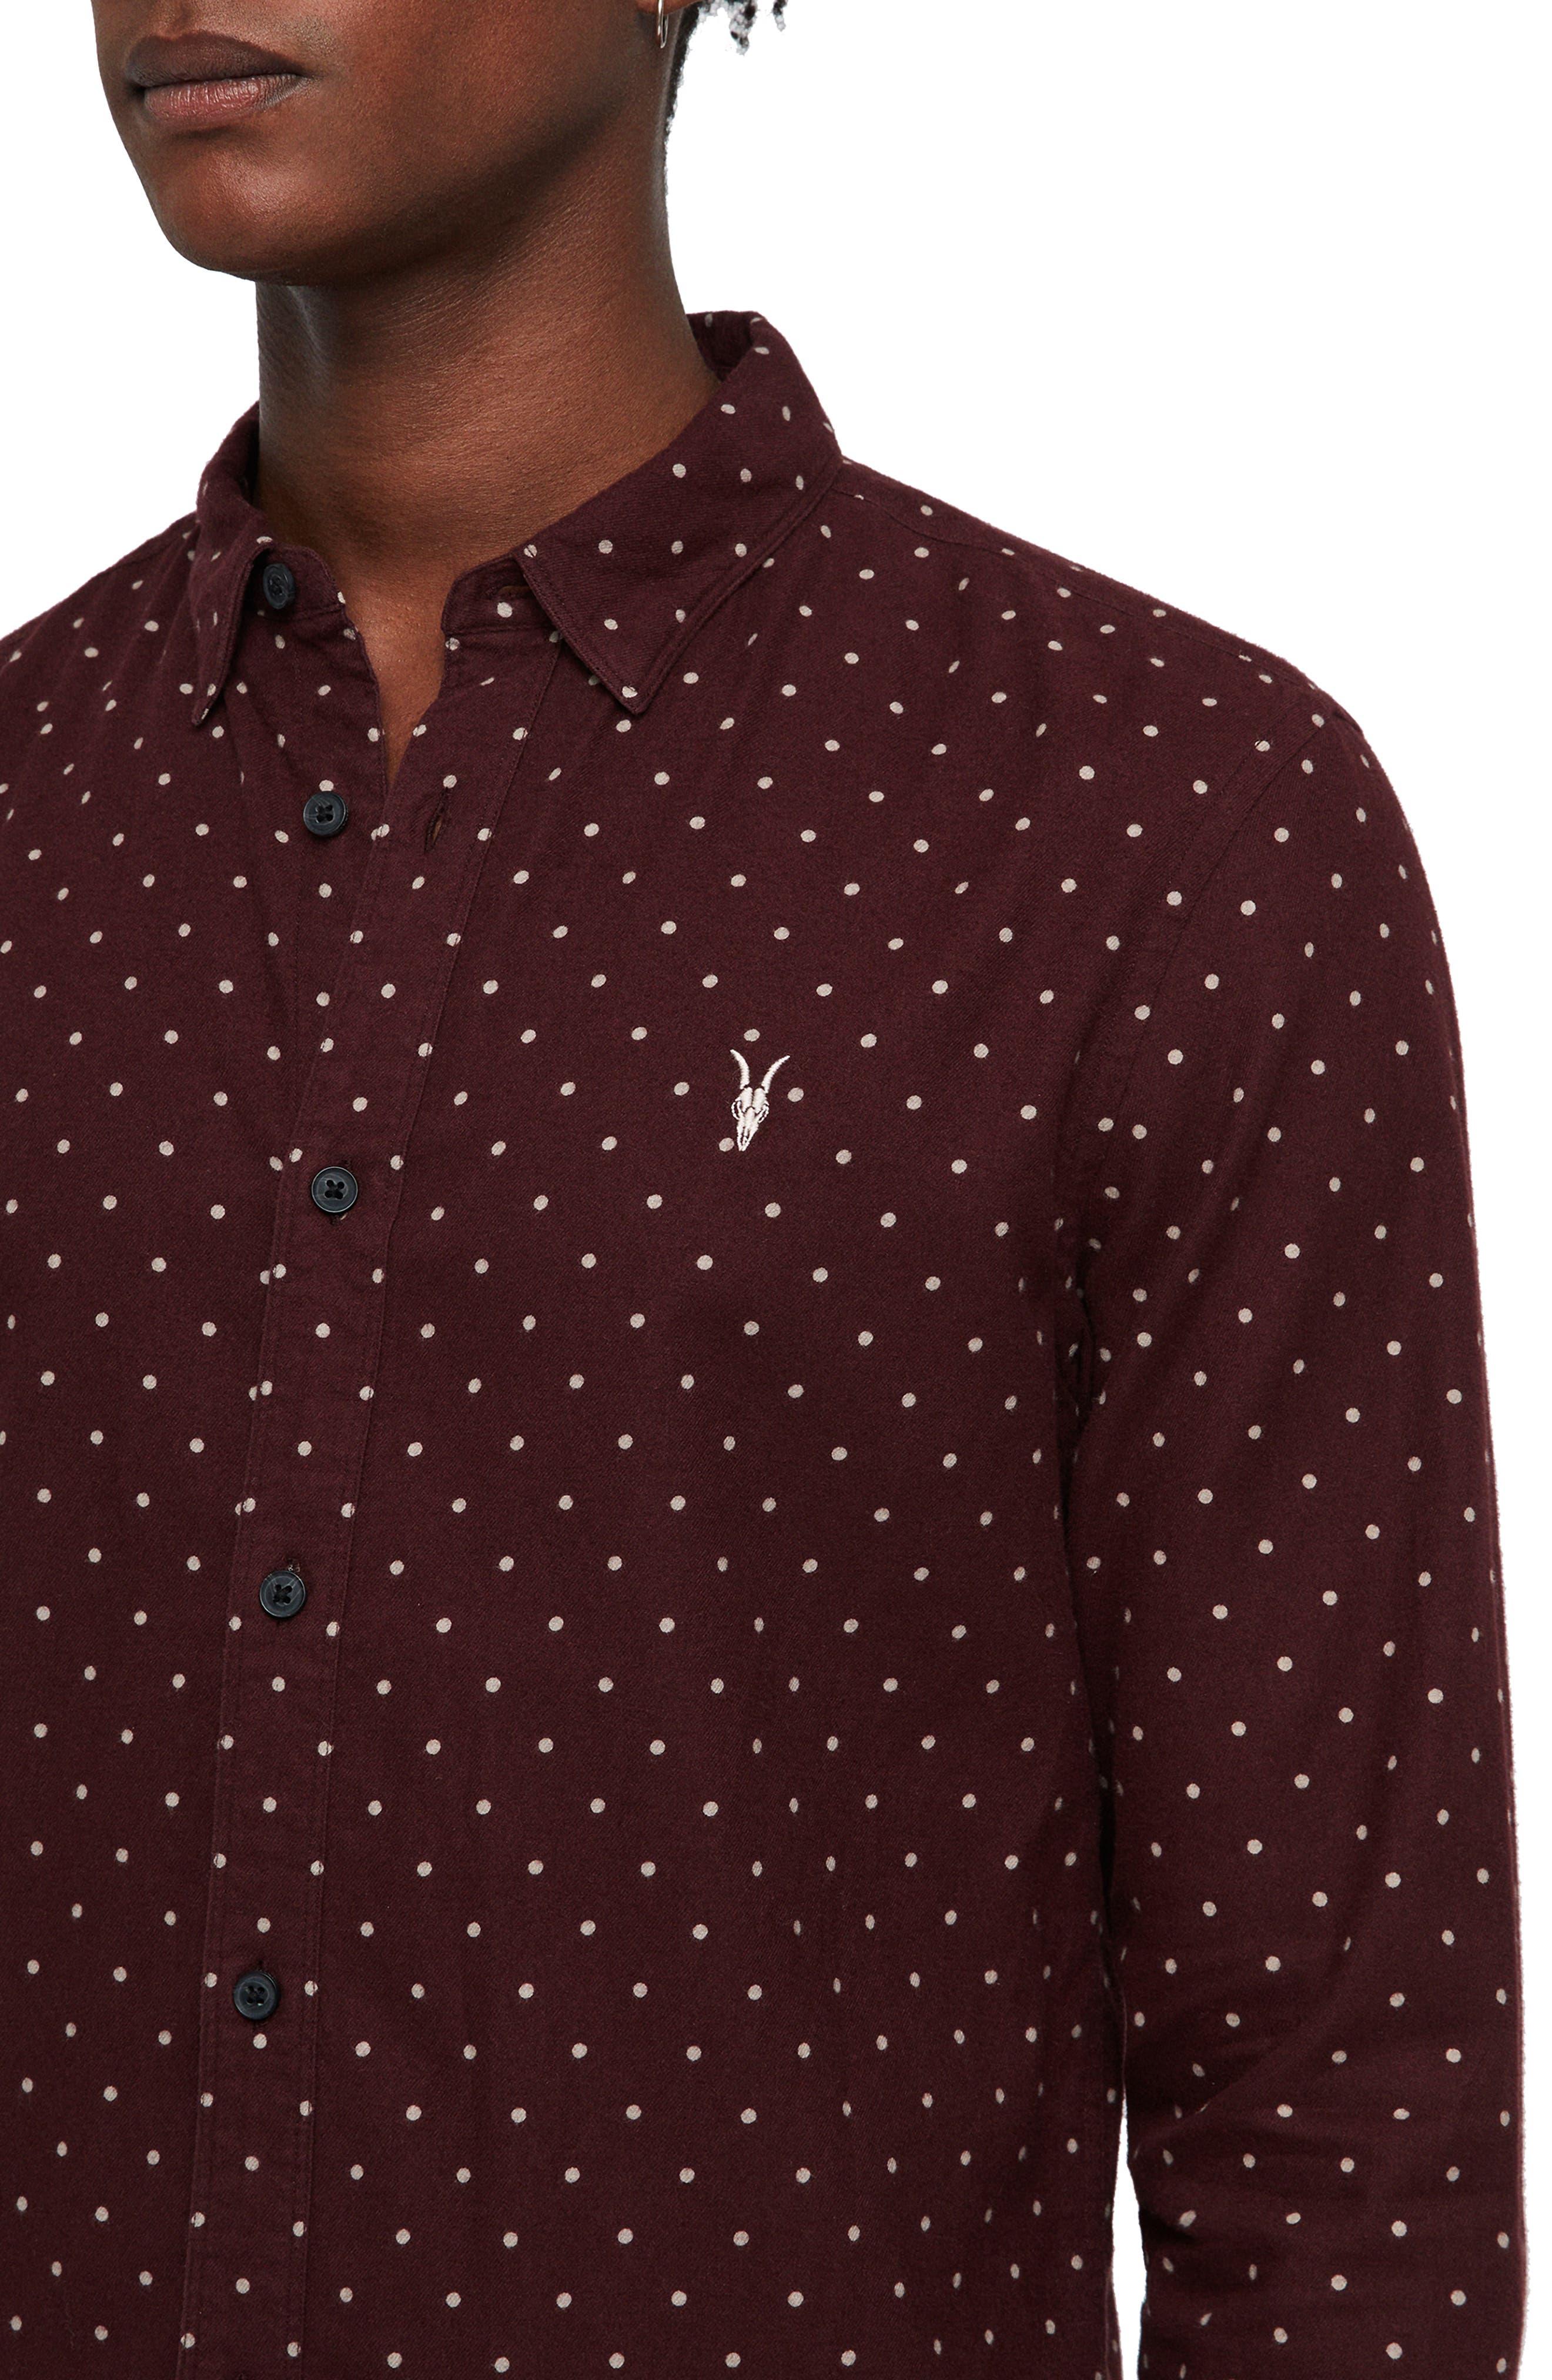 Bethel Slim Fit Dot Flannel Shirt,                             Alternate thumbnail 2, color,                             DARK RUST/ ECRU